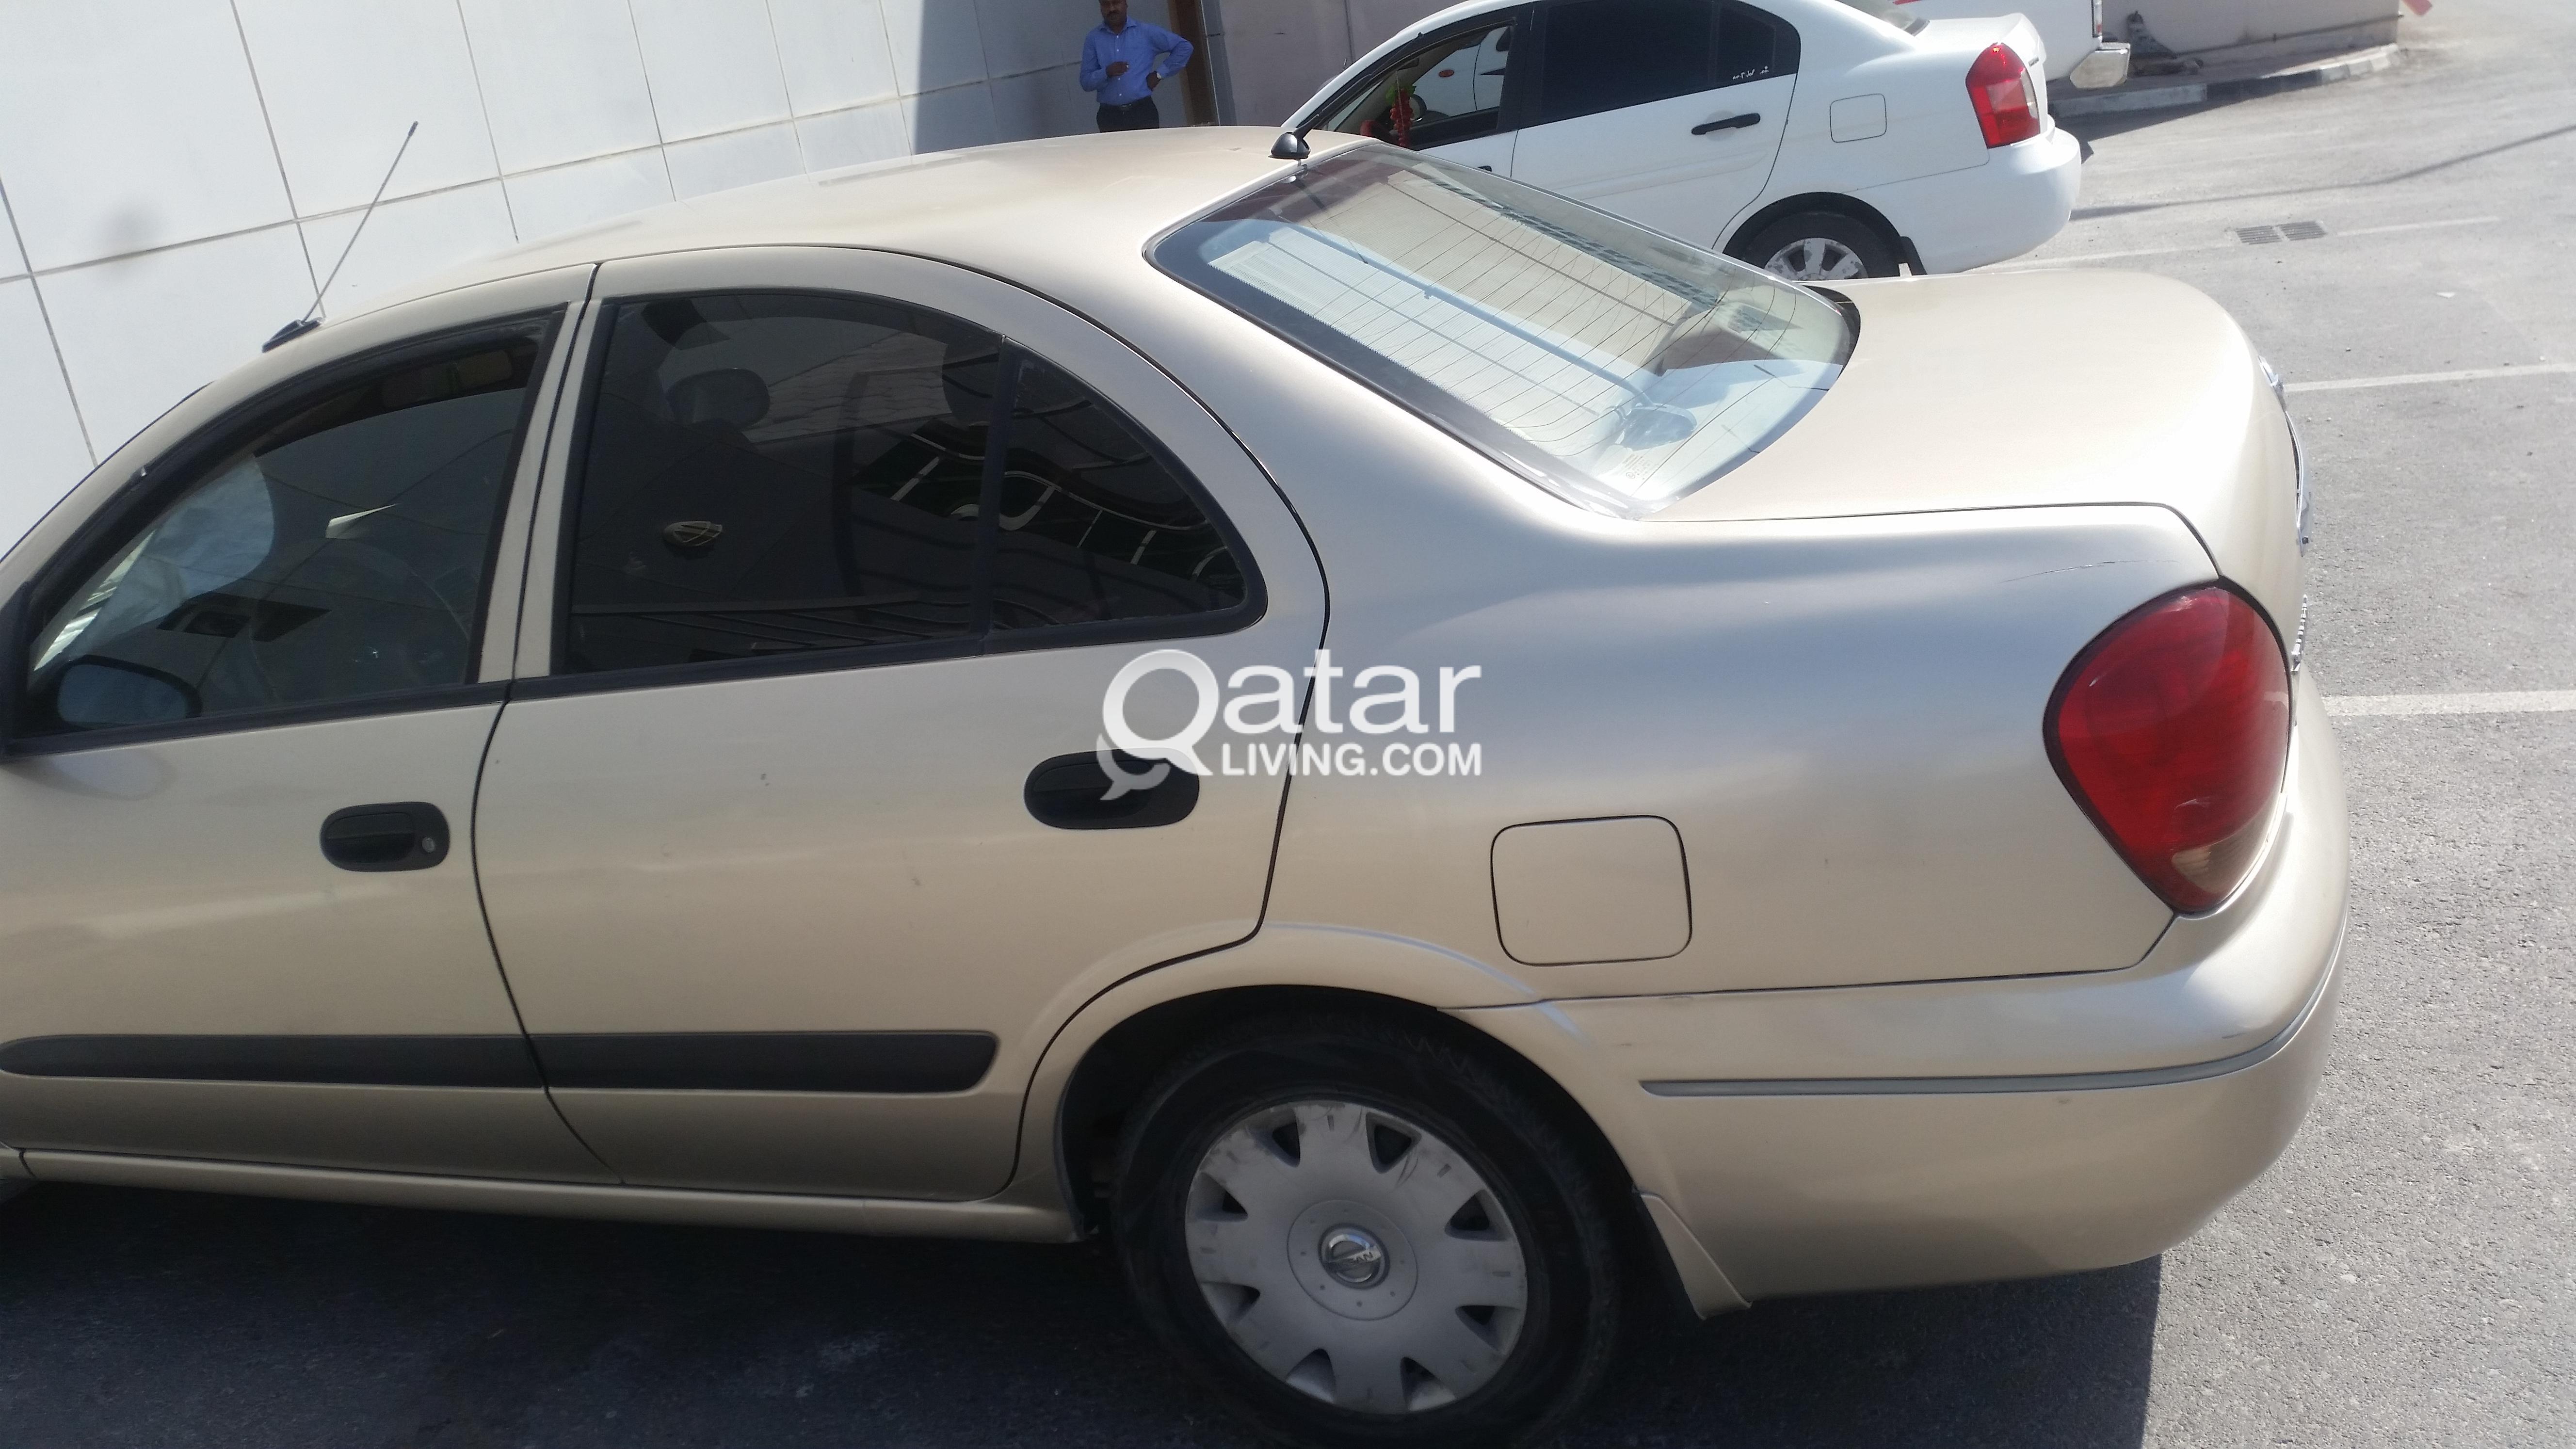 Qatar Living Car For Sale Nissan